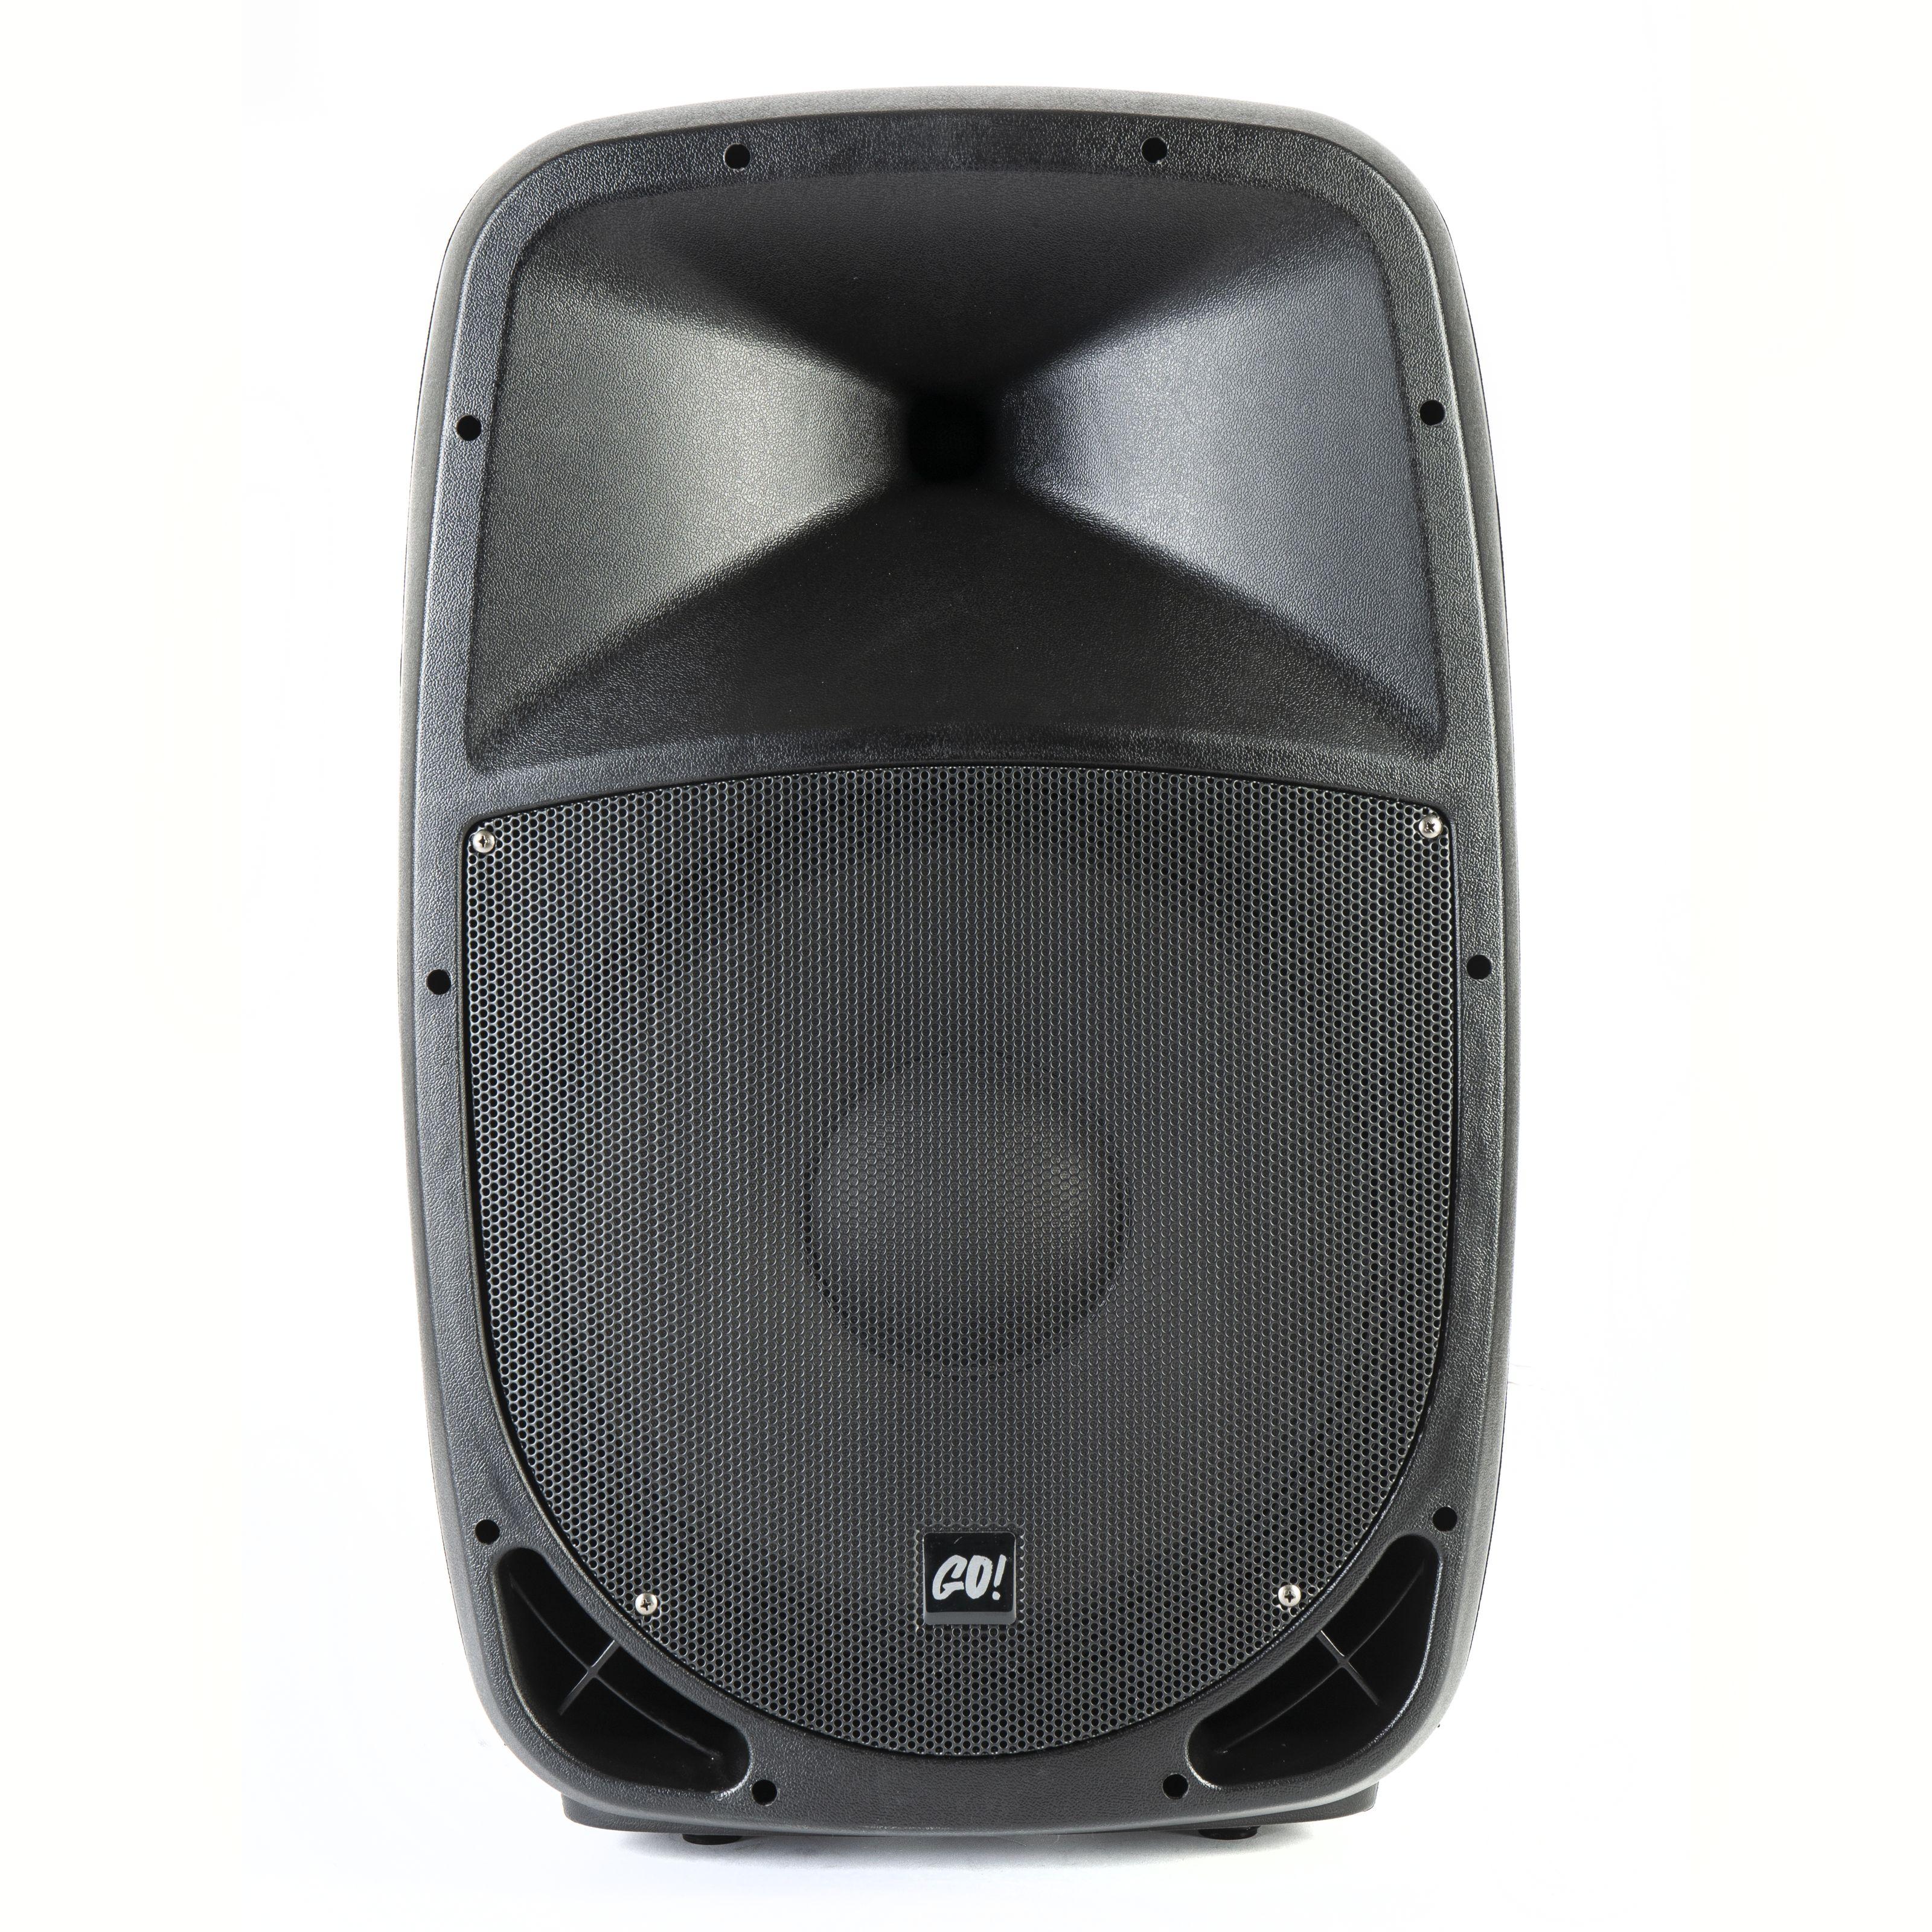 MUSIC STORE - GO! 15P 15 passive Lautsprecher GO! 15 passive